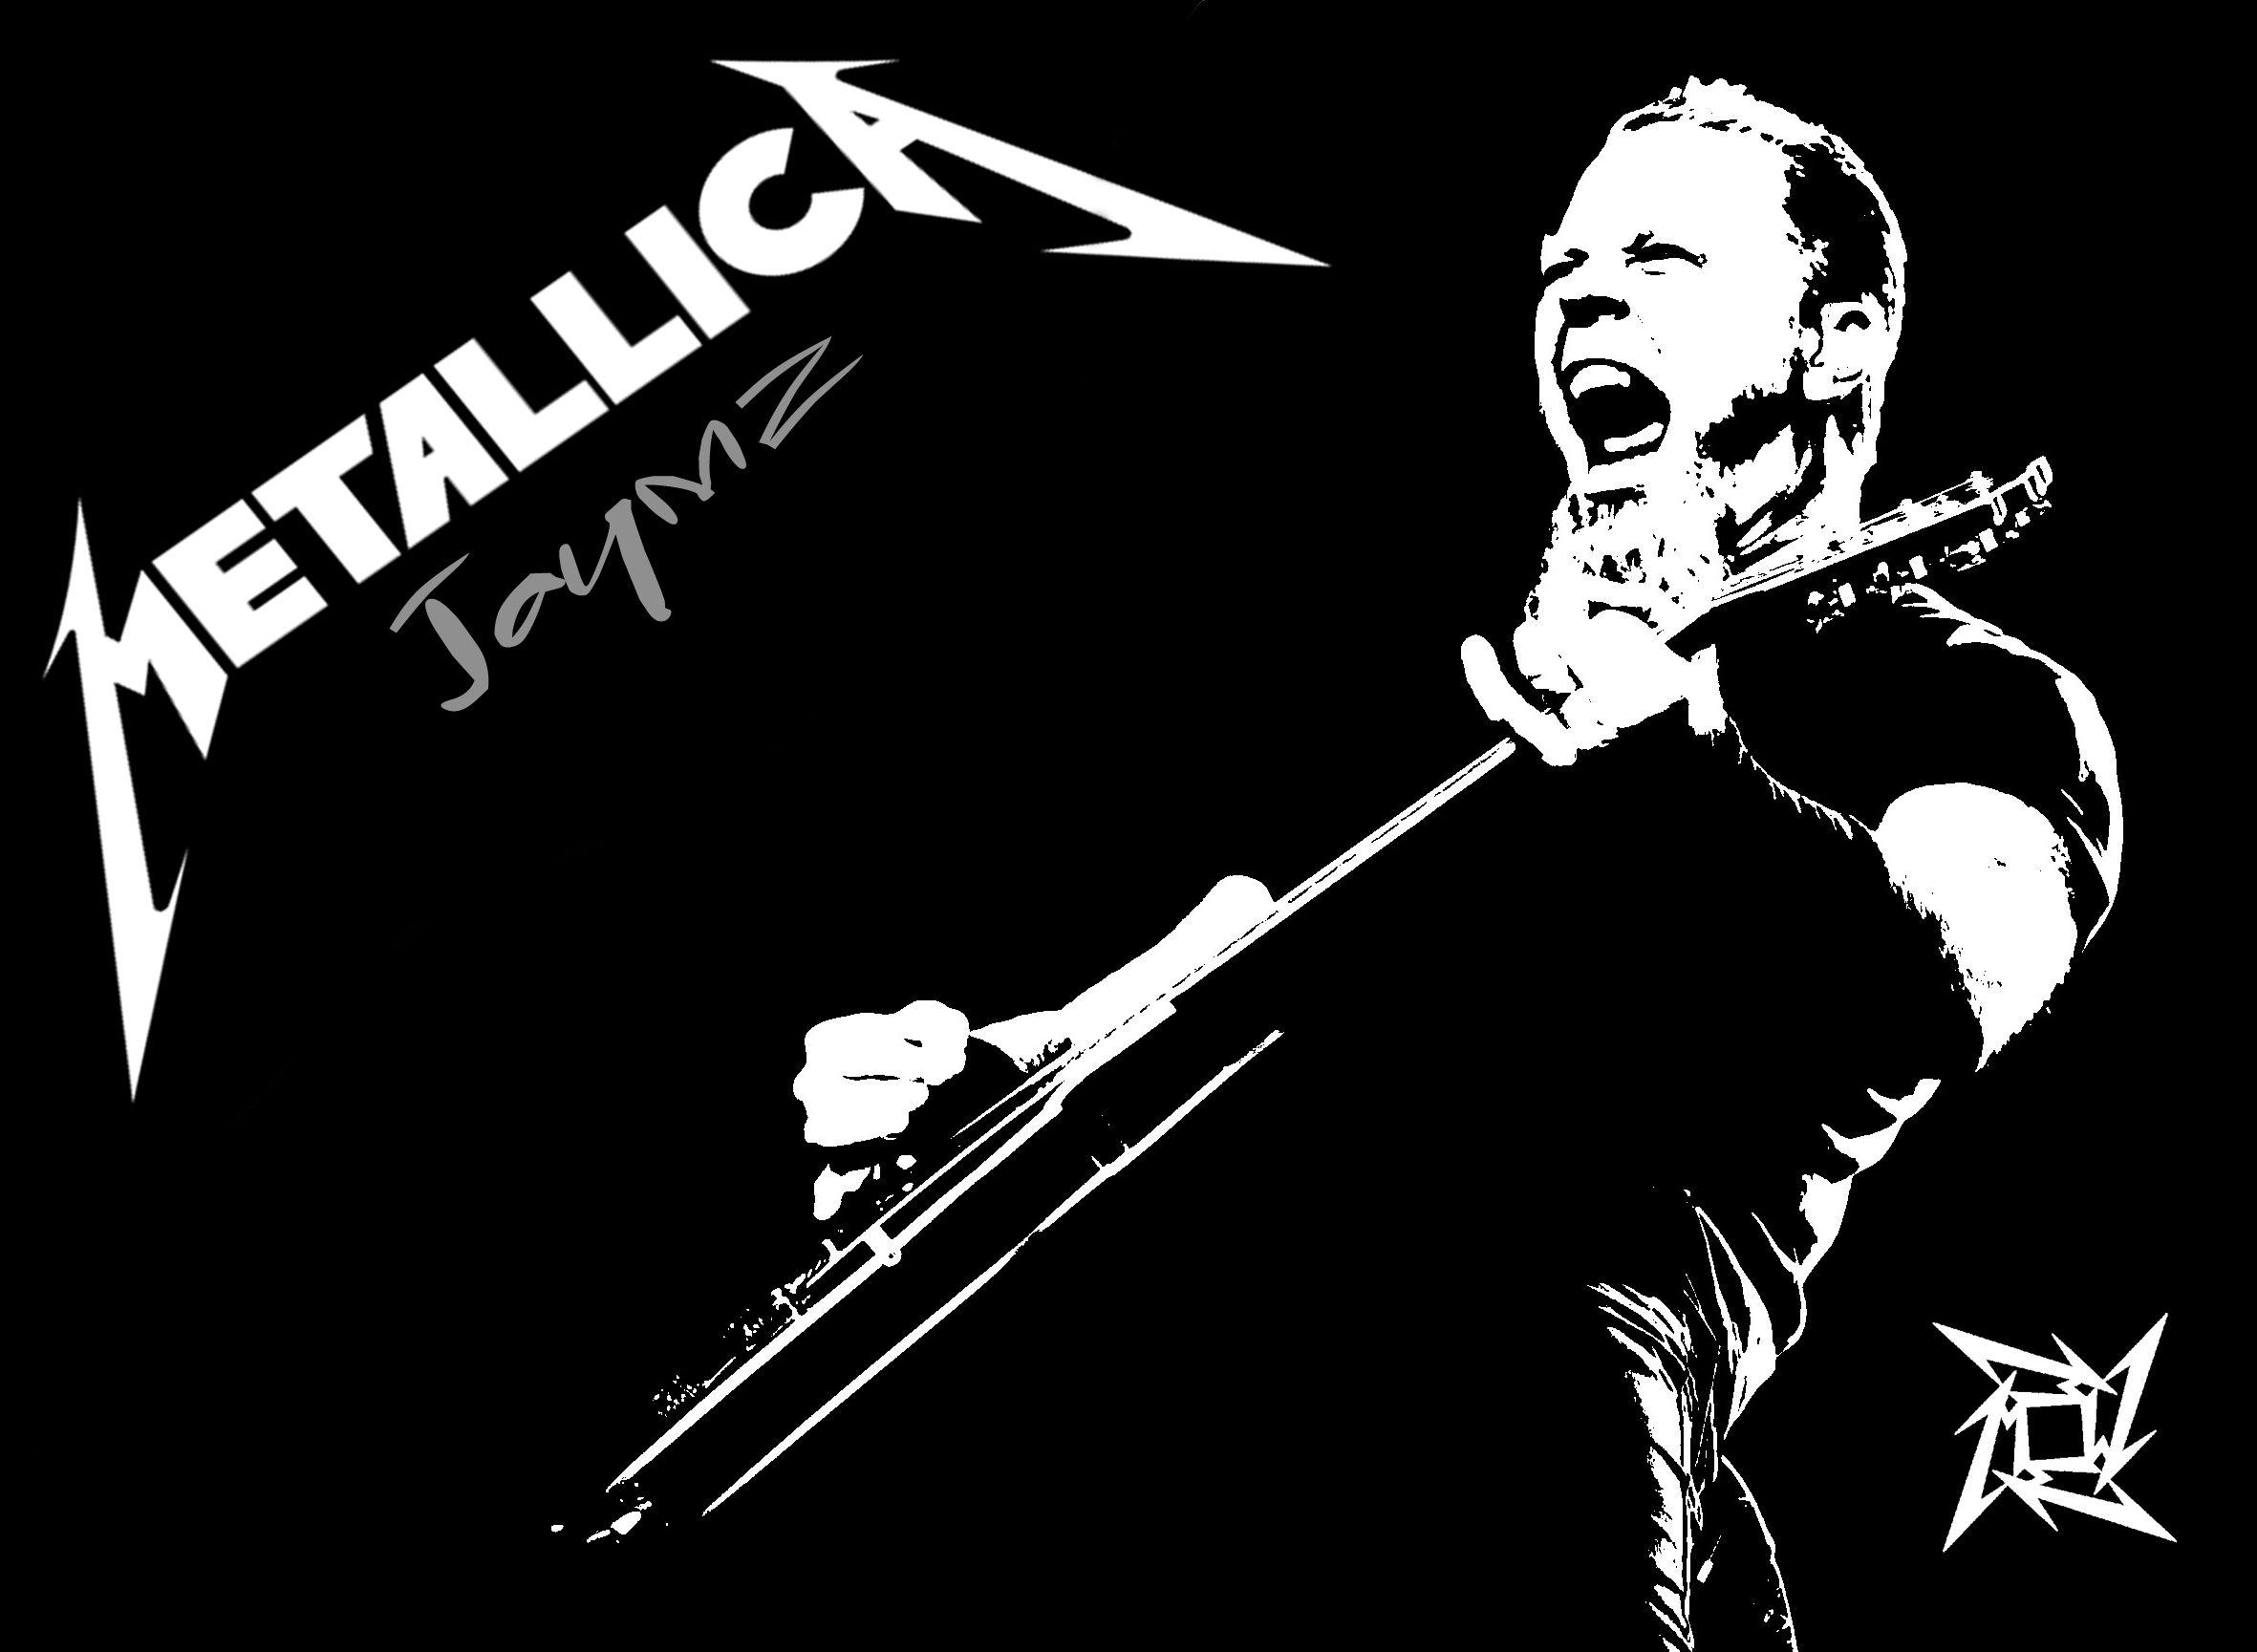 Mettalica Metallica, Metallica logo, Band wallpapers